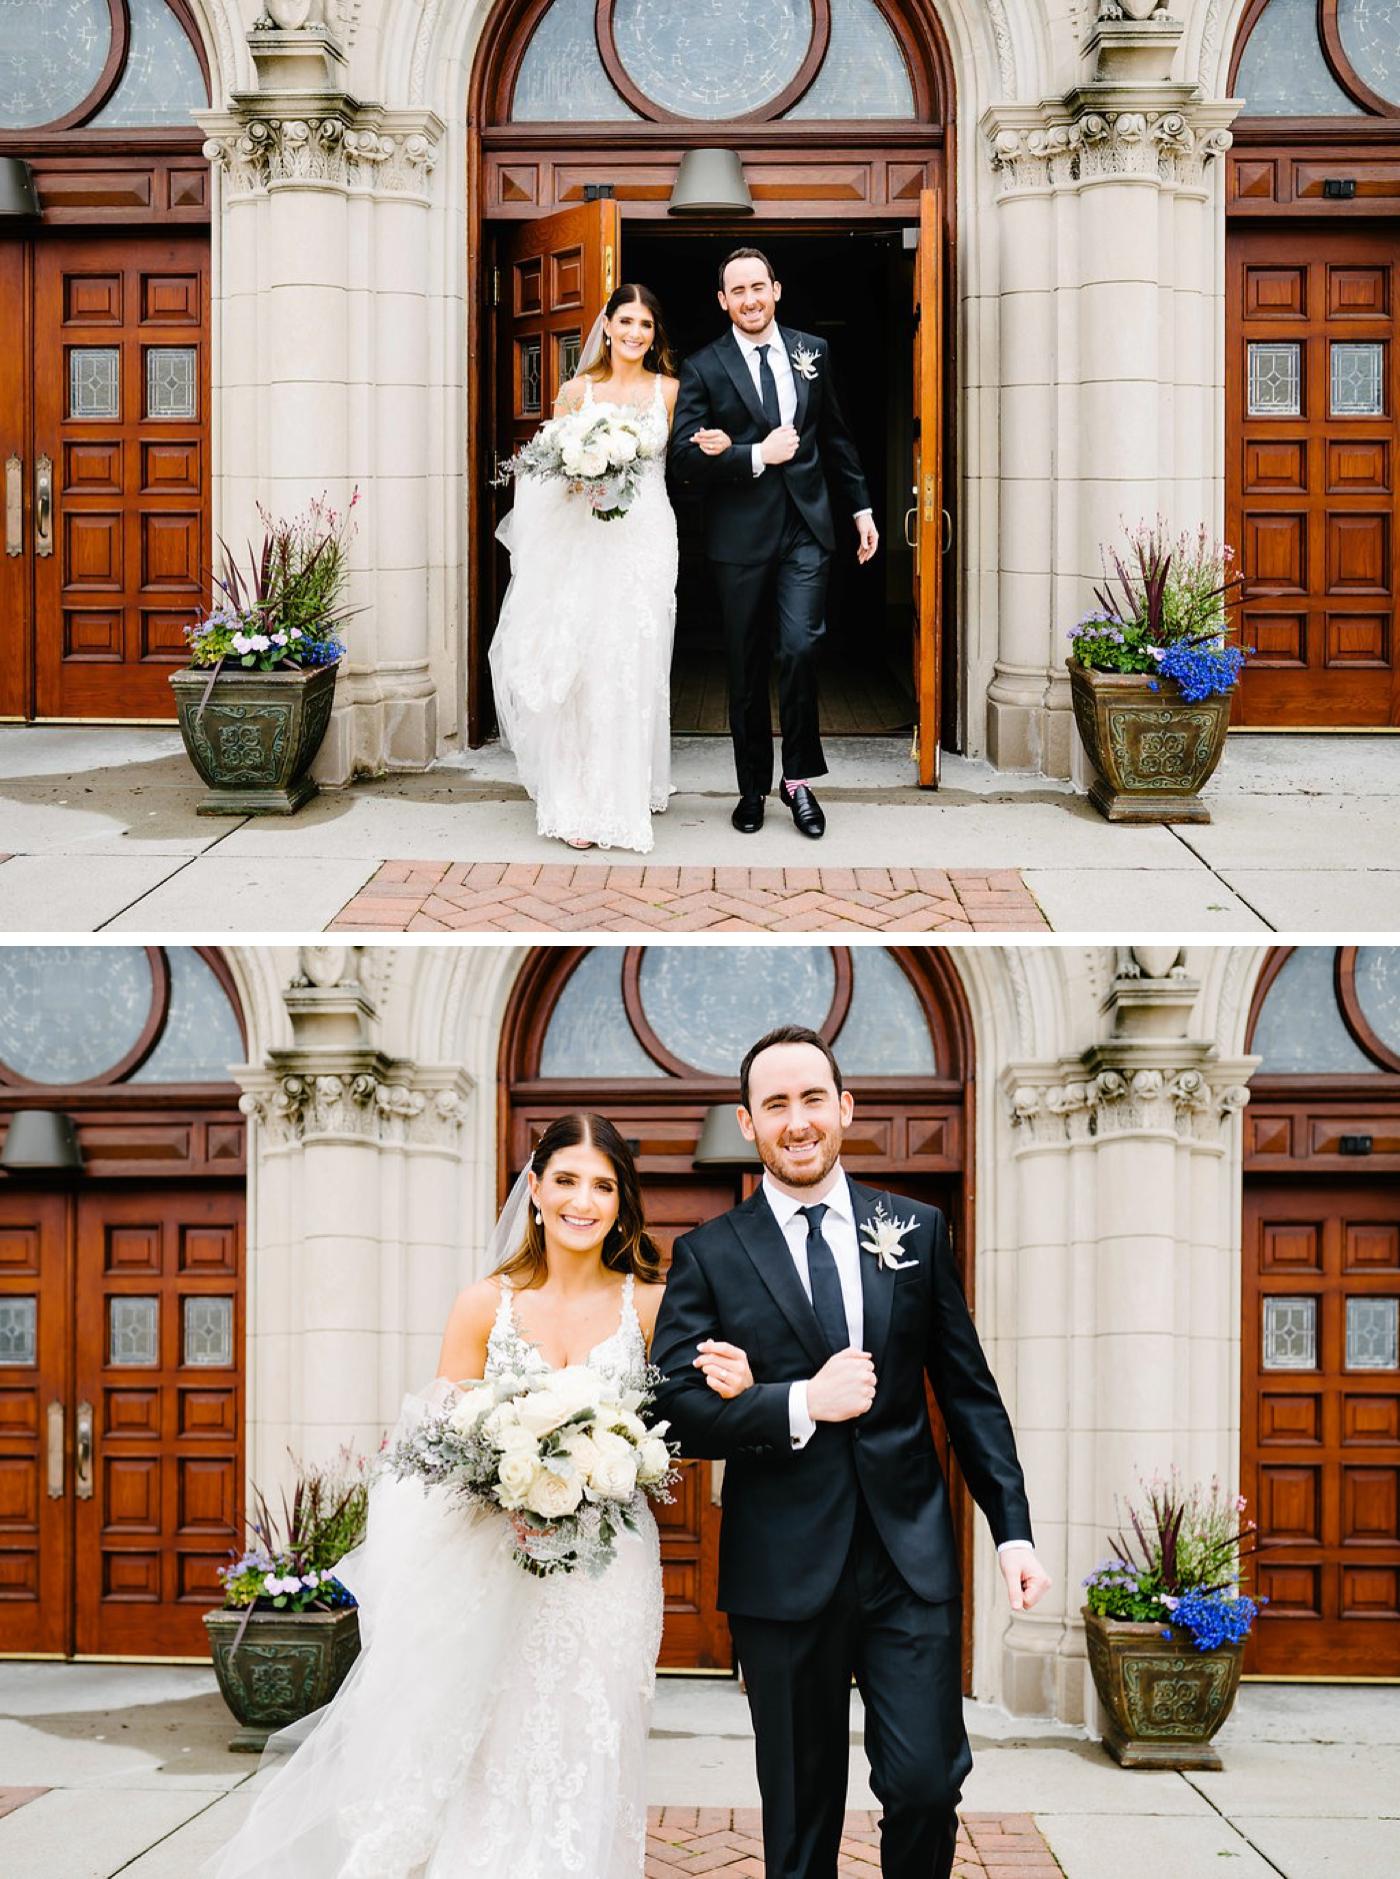 chicago-fine-art-wedding-photography-duncan46